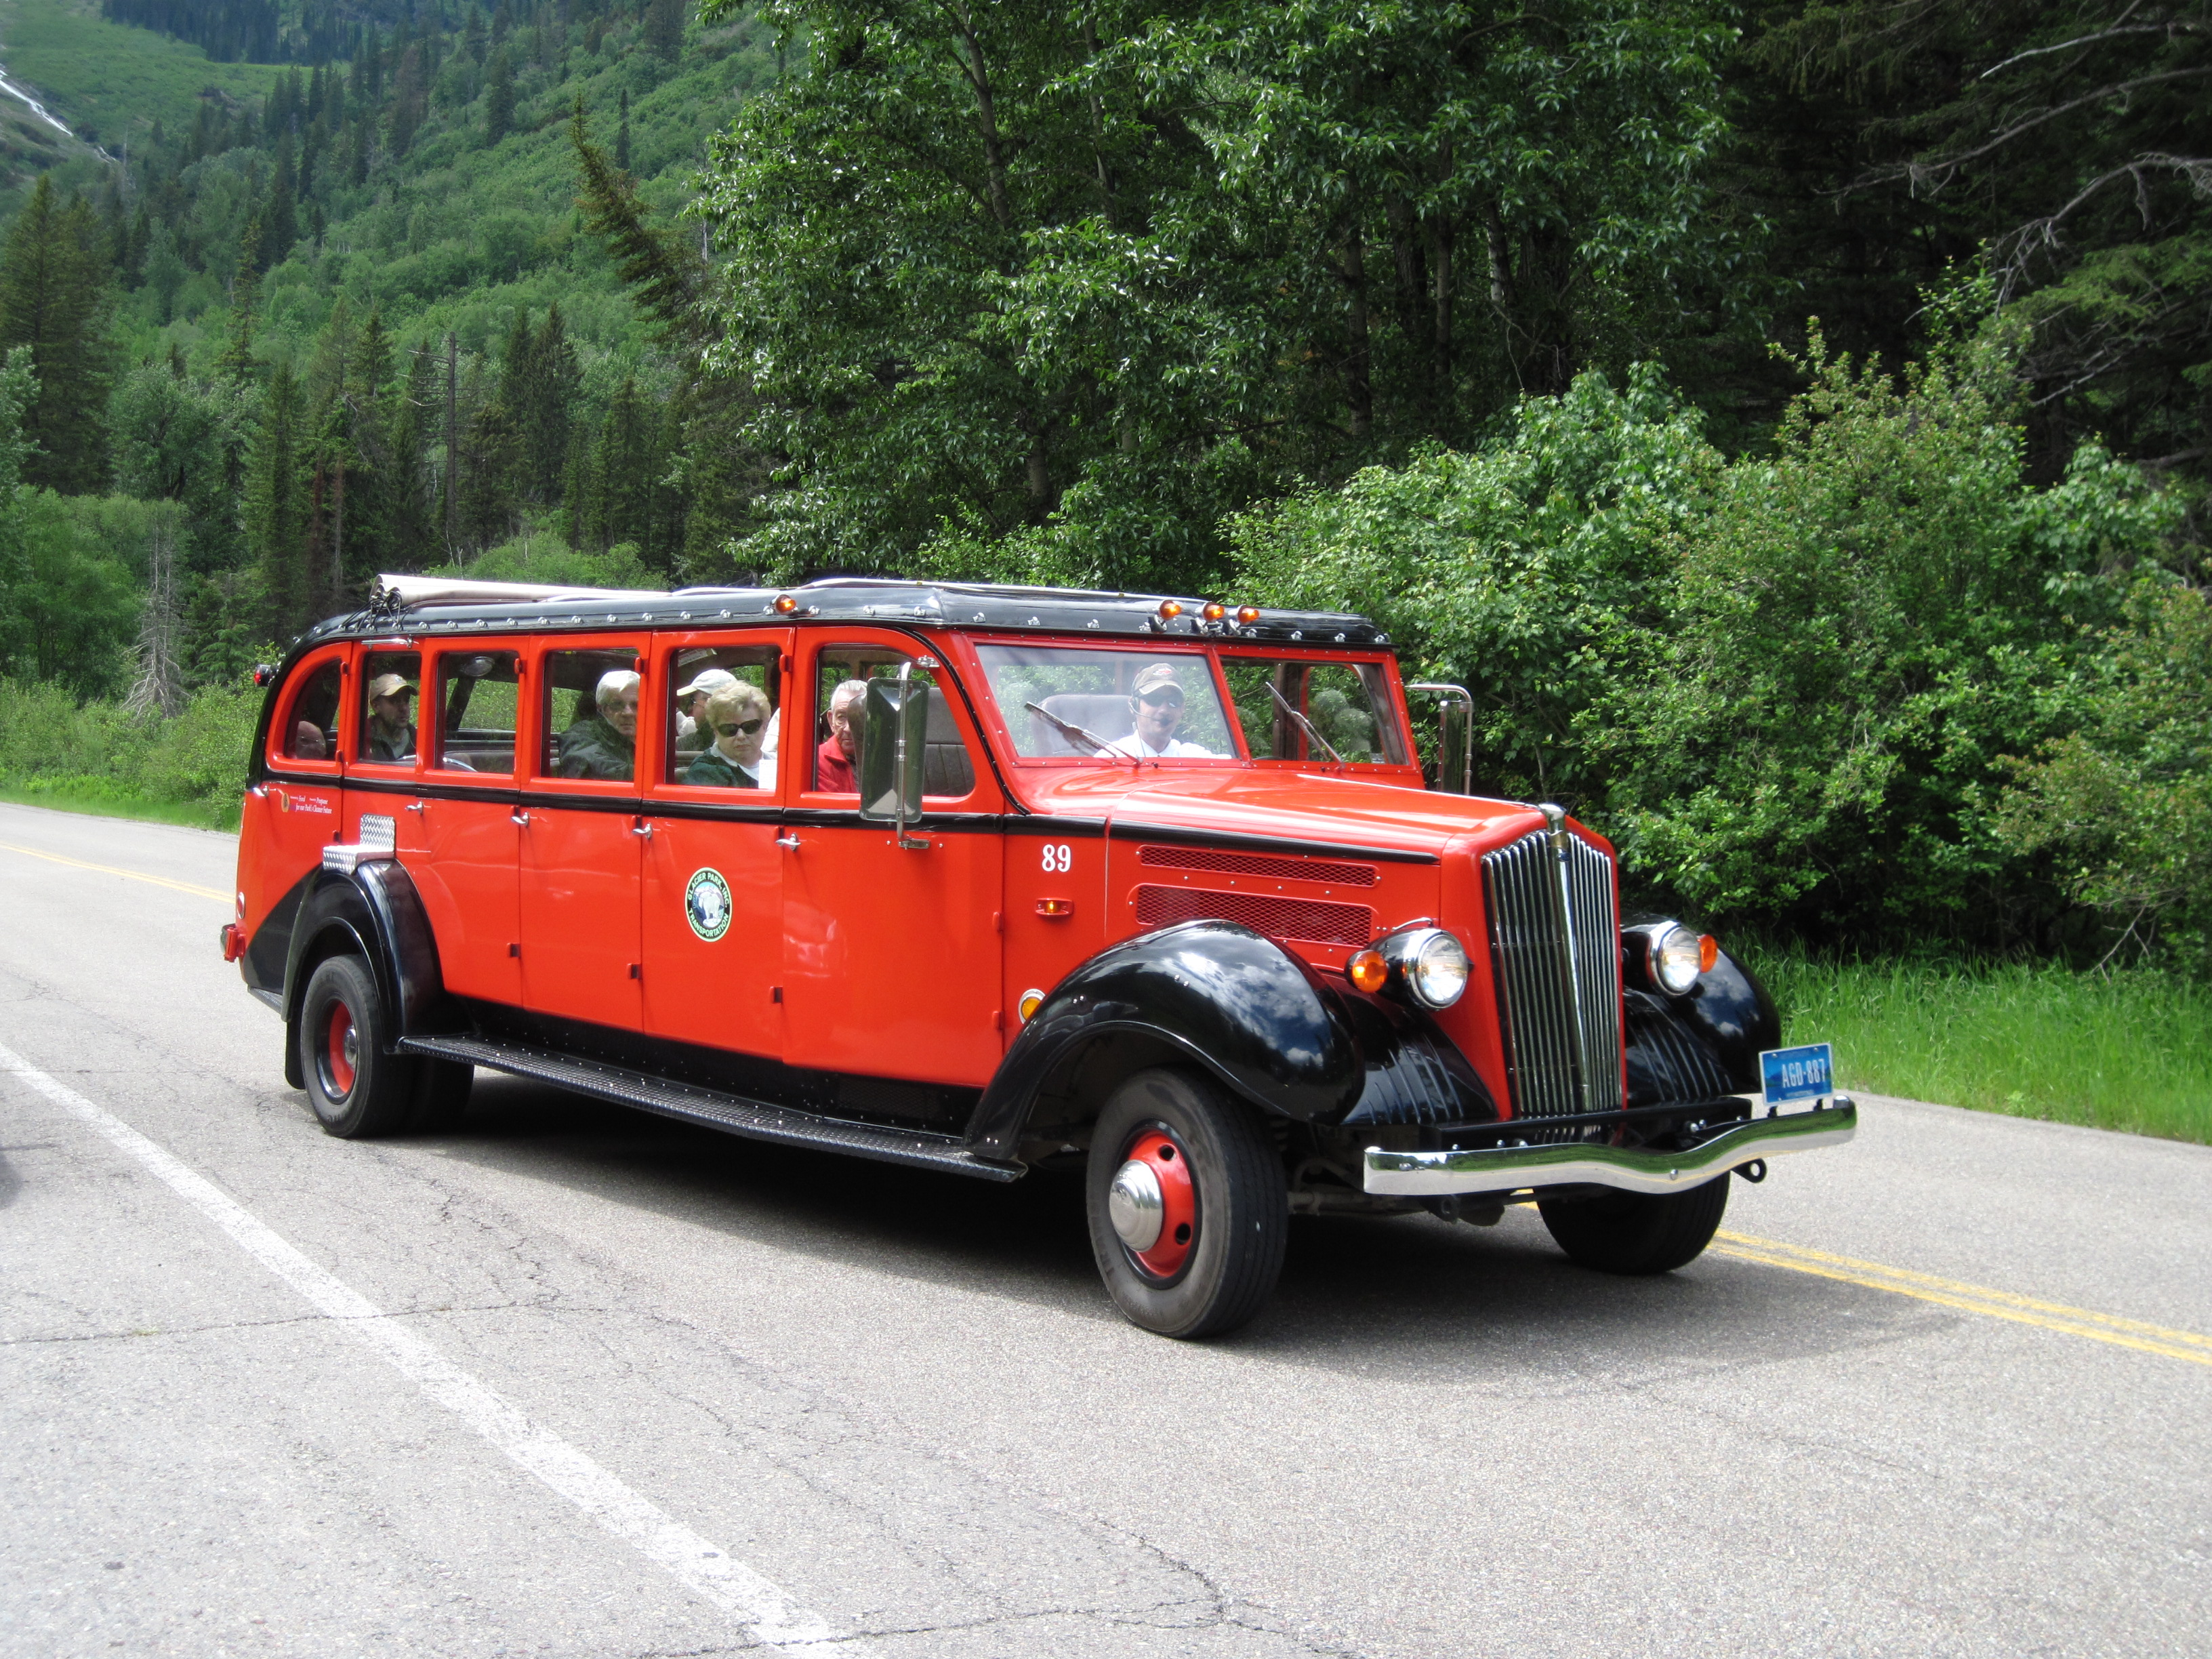 Glacier National Park visitors enjoy a ride in a vintage 1930s-era bus, Glacier National Park, Montana, June 21, 2009   Photo courtesy Melanie Walden, St. George News